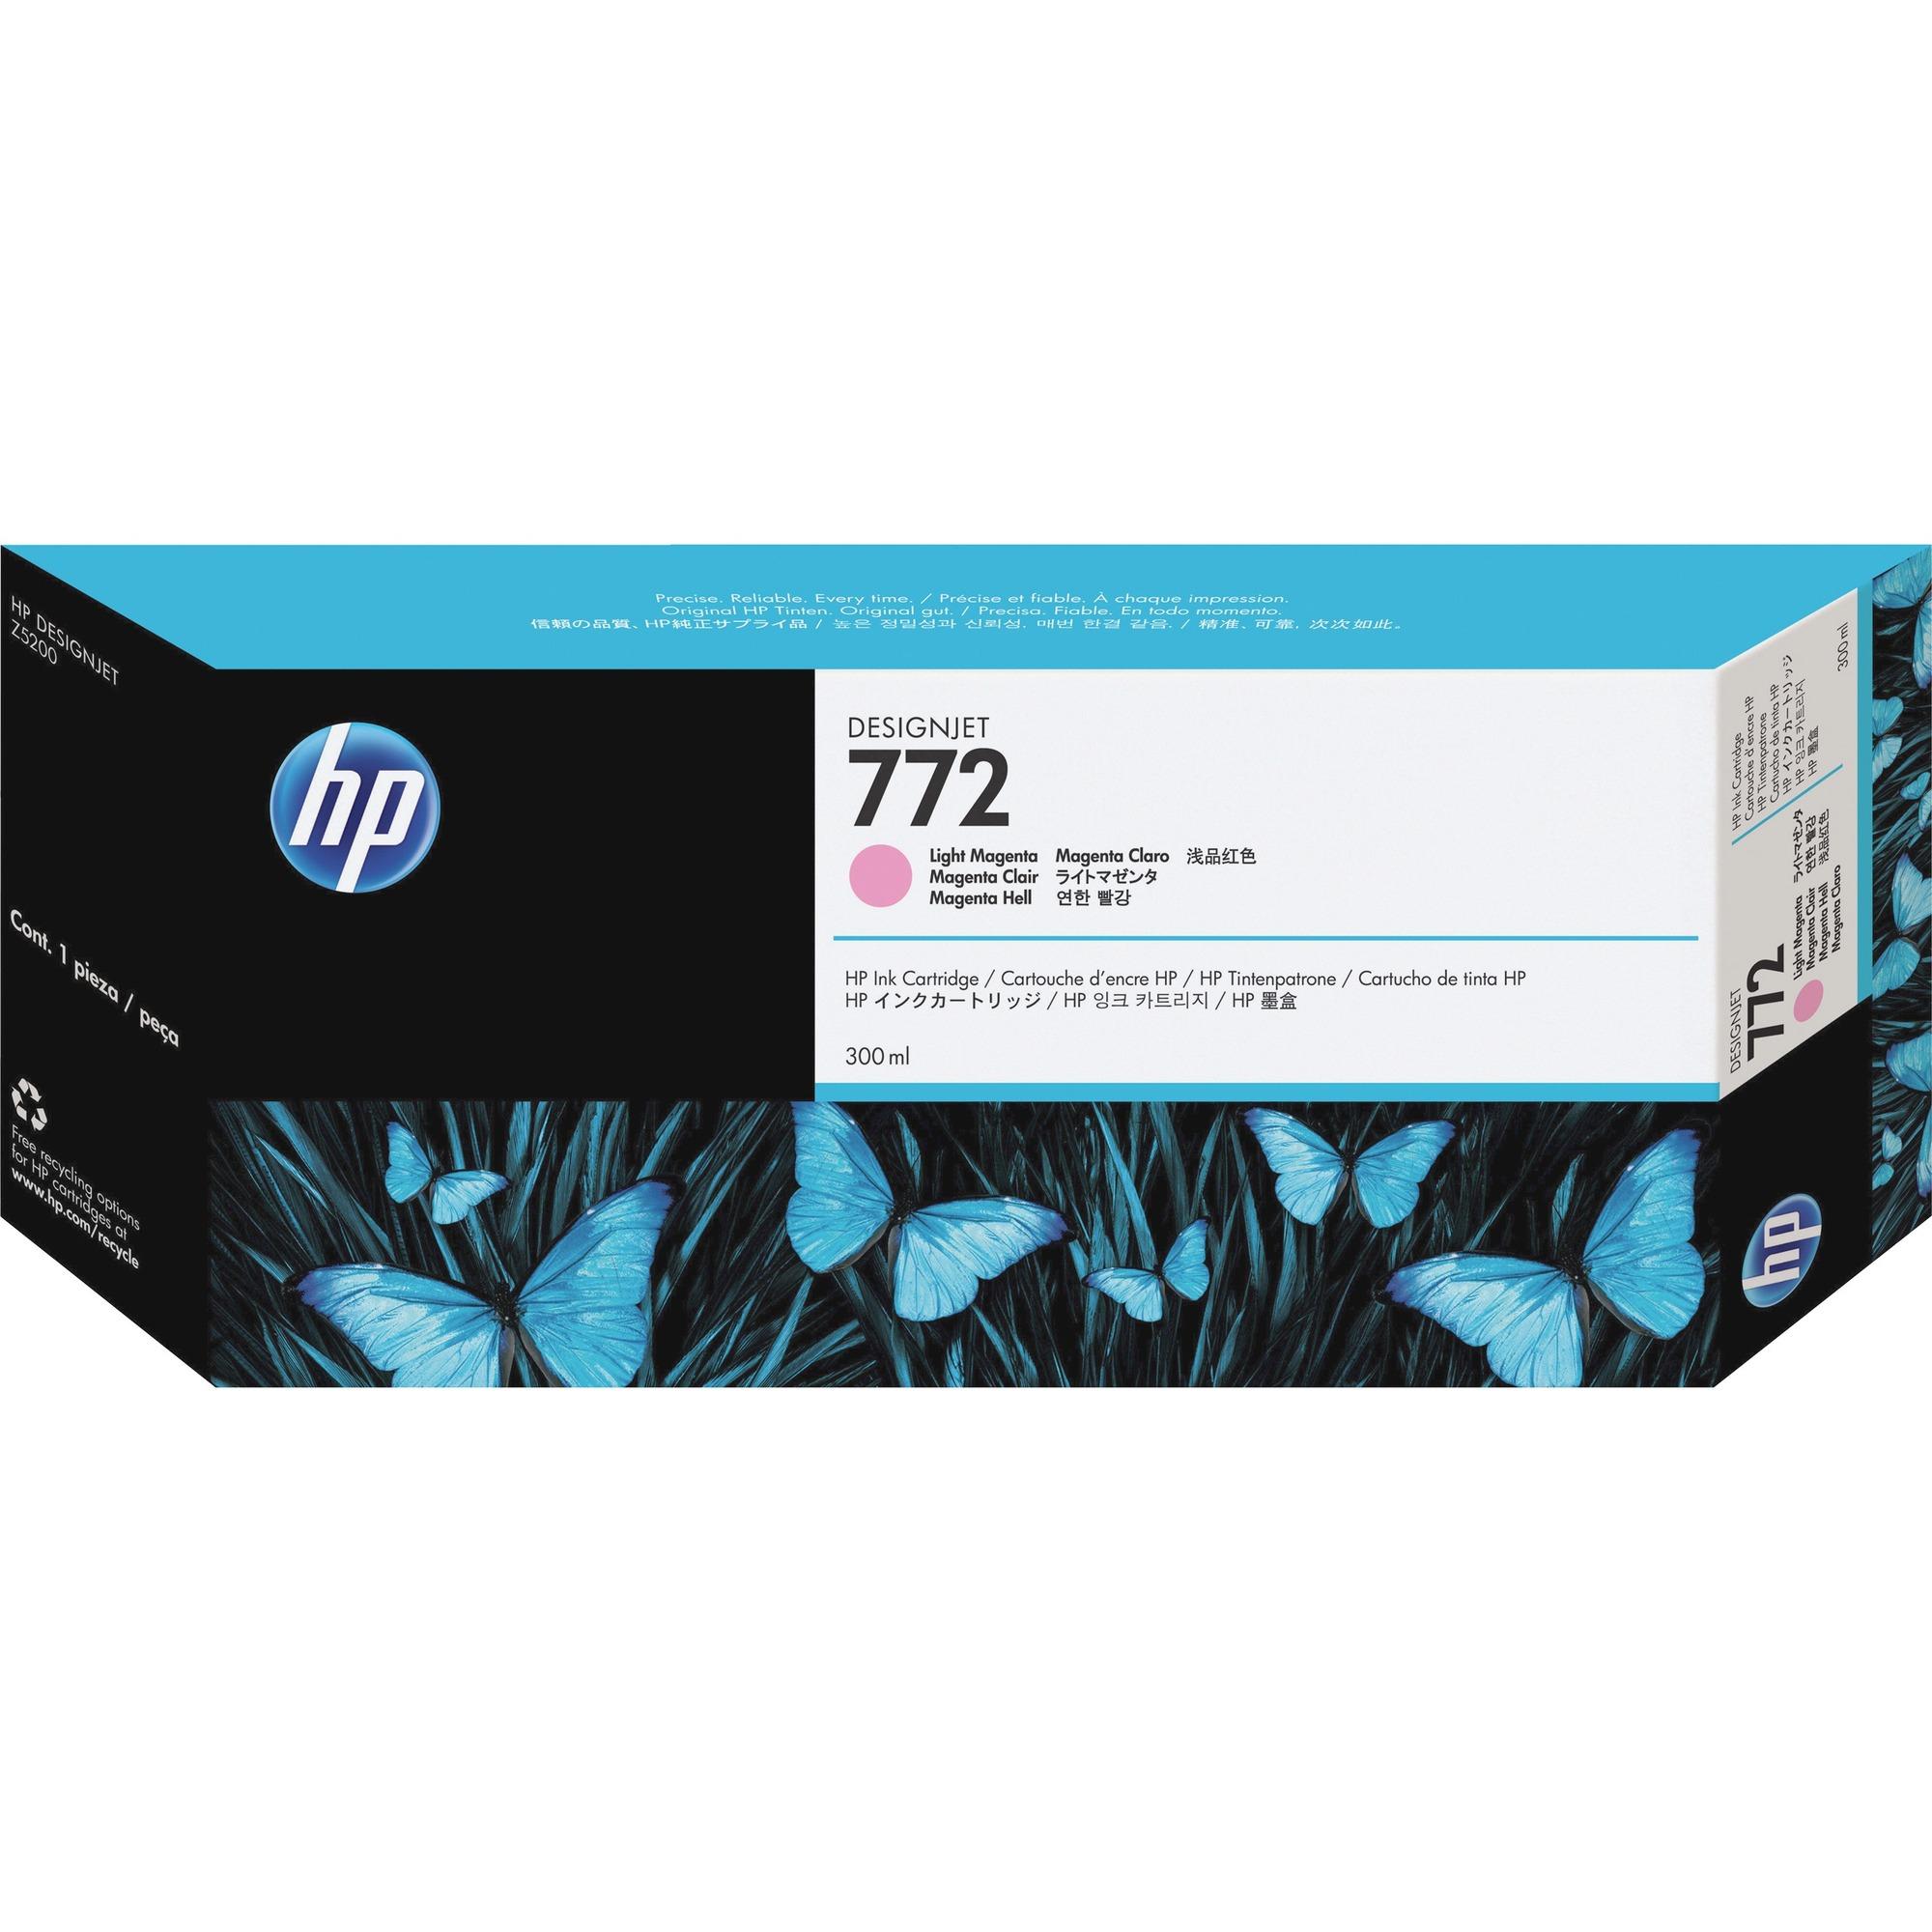 HP No. 772 Ink Cartridge - Light Magenta